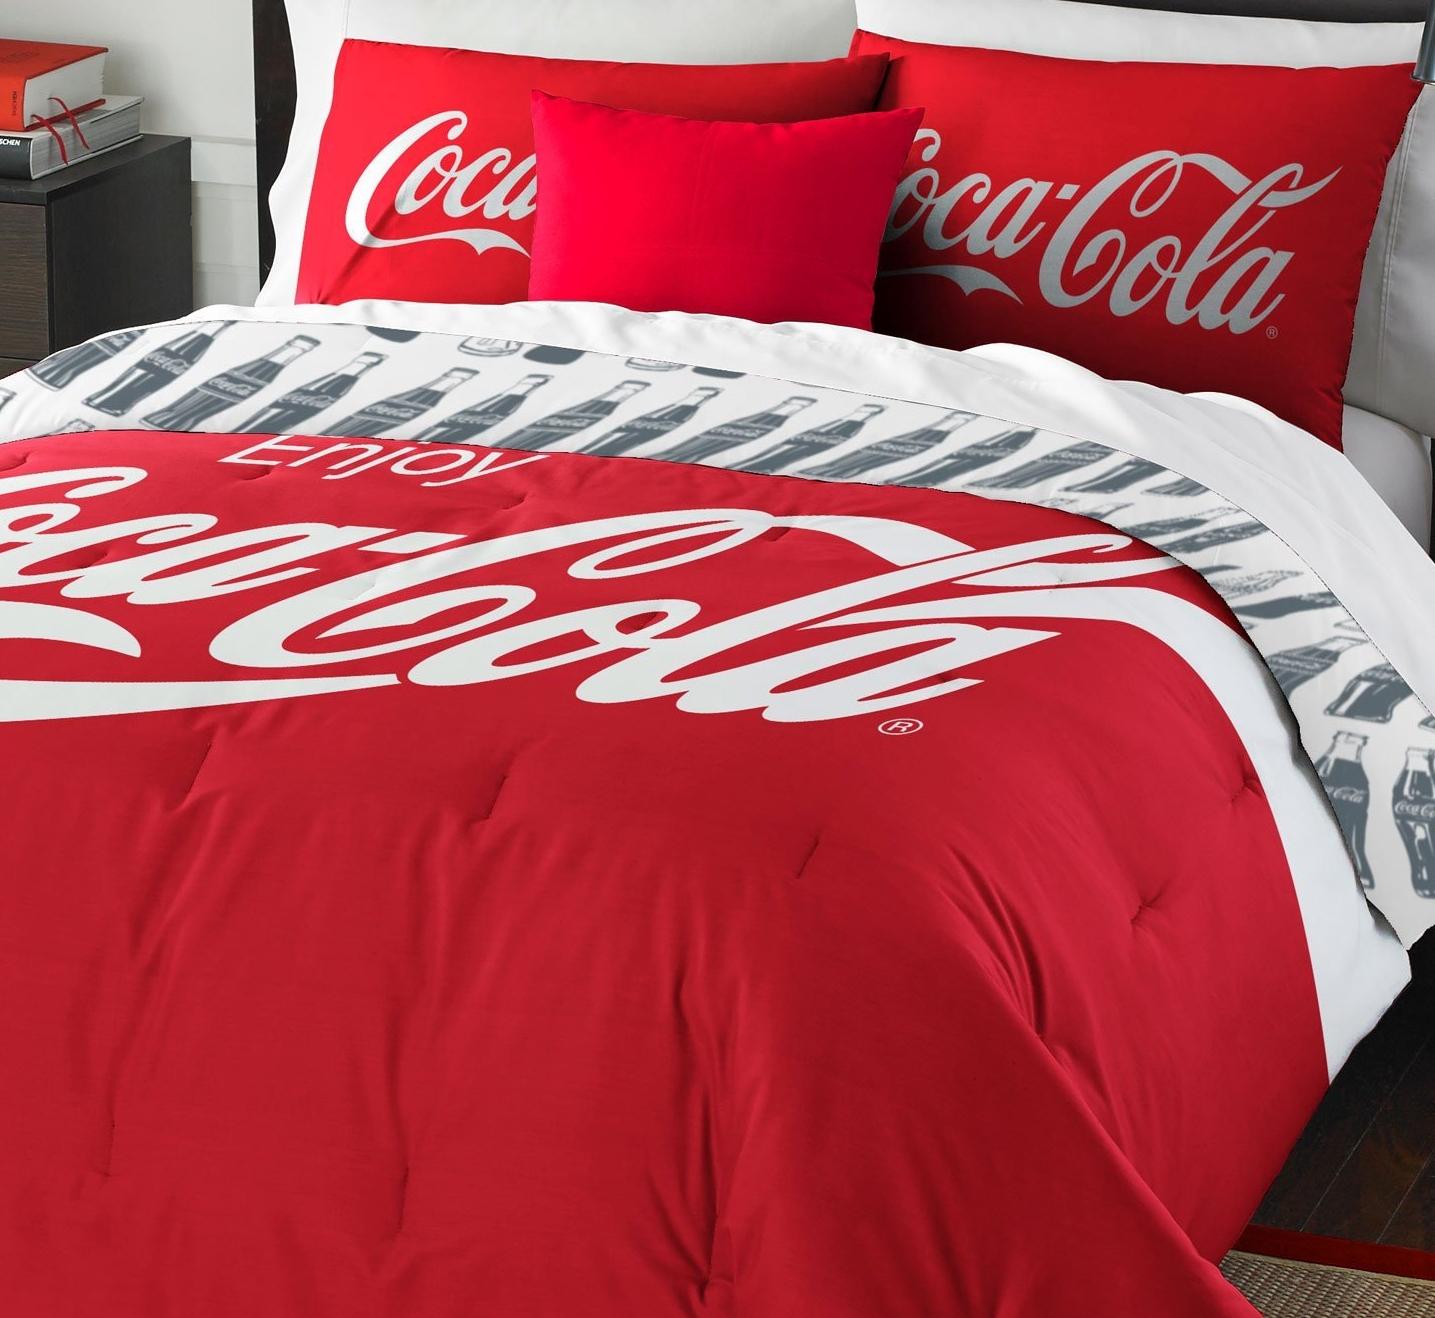 Coca-Cola Logo Twin Bedding Set